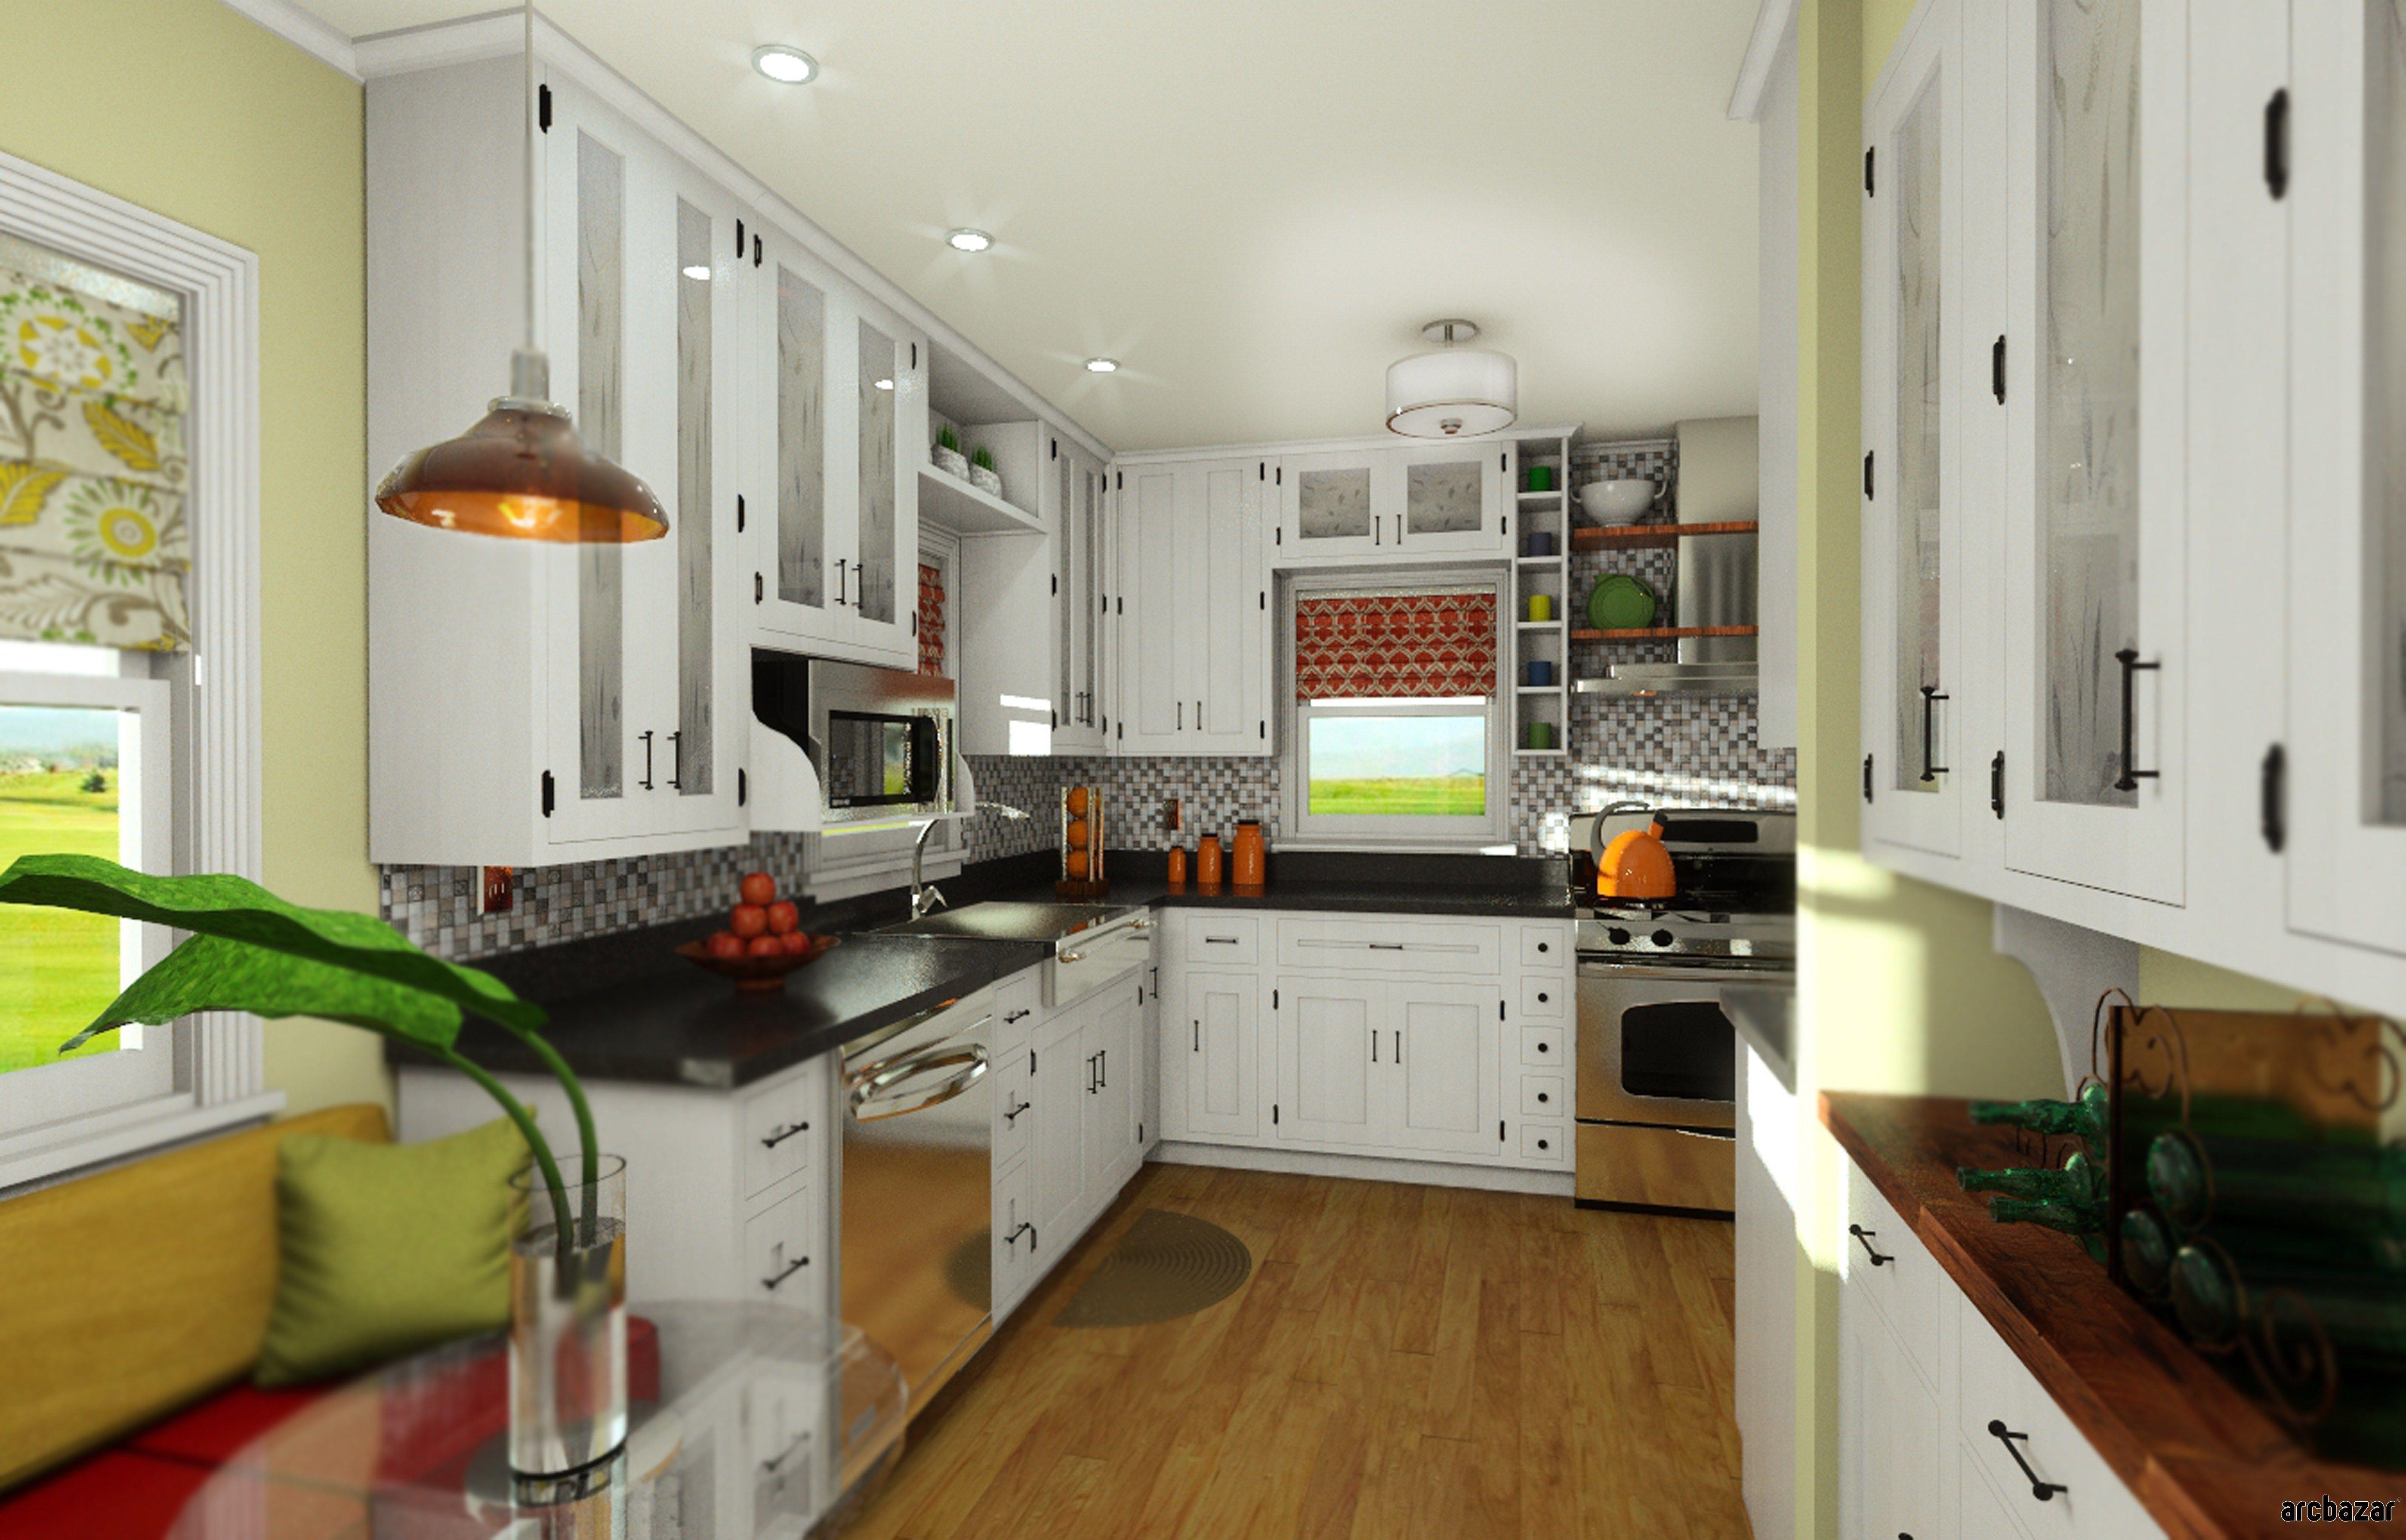 Beau Kitchen Remodel Design By Wrightdzign Via Arcbazar.com